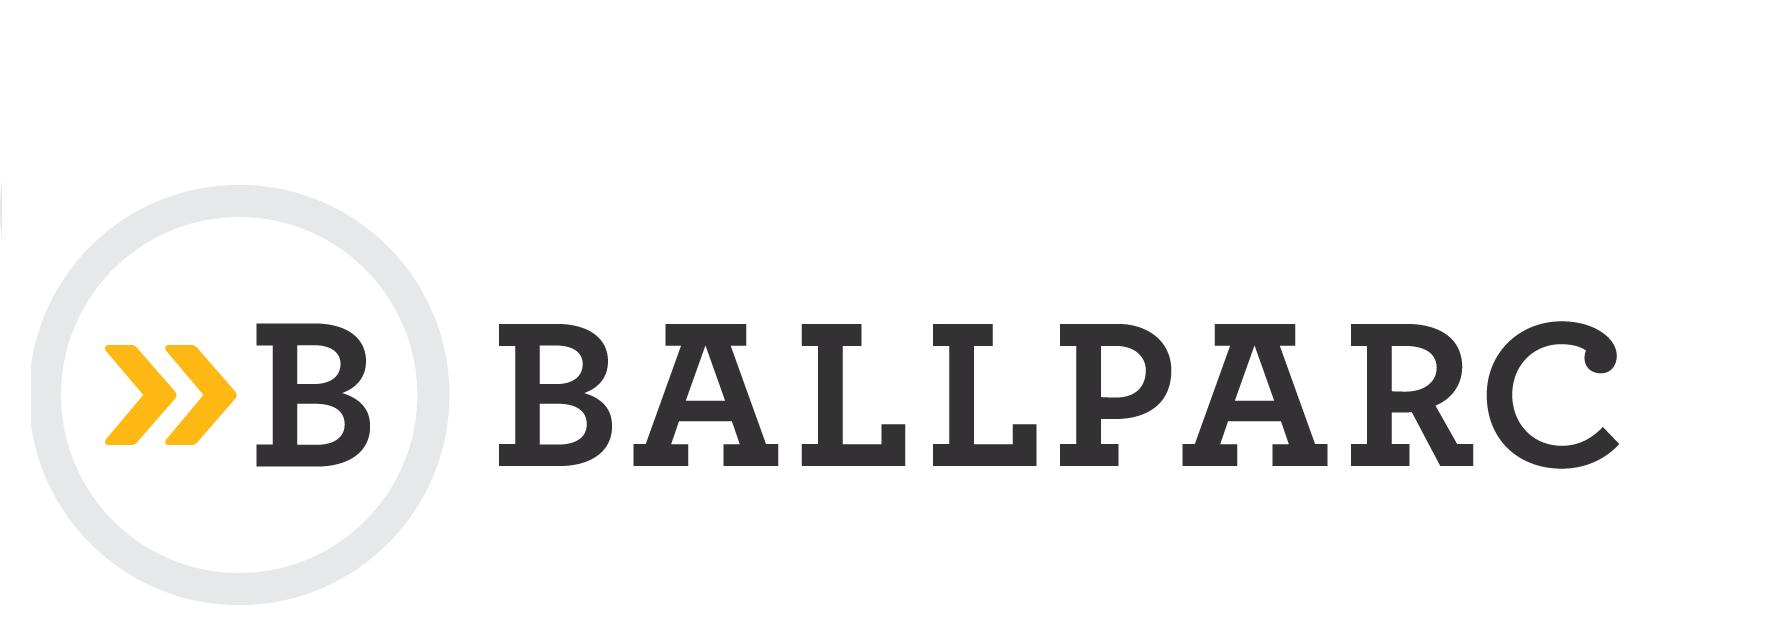 Ballparc Logo